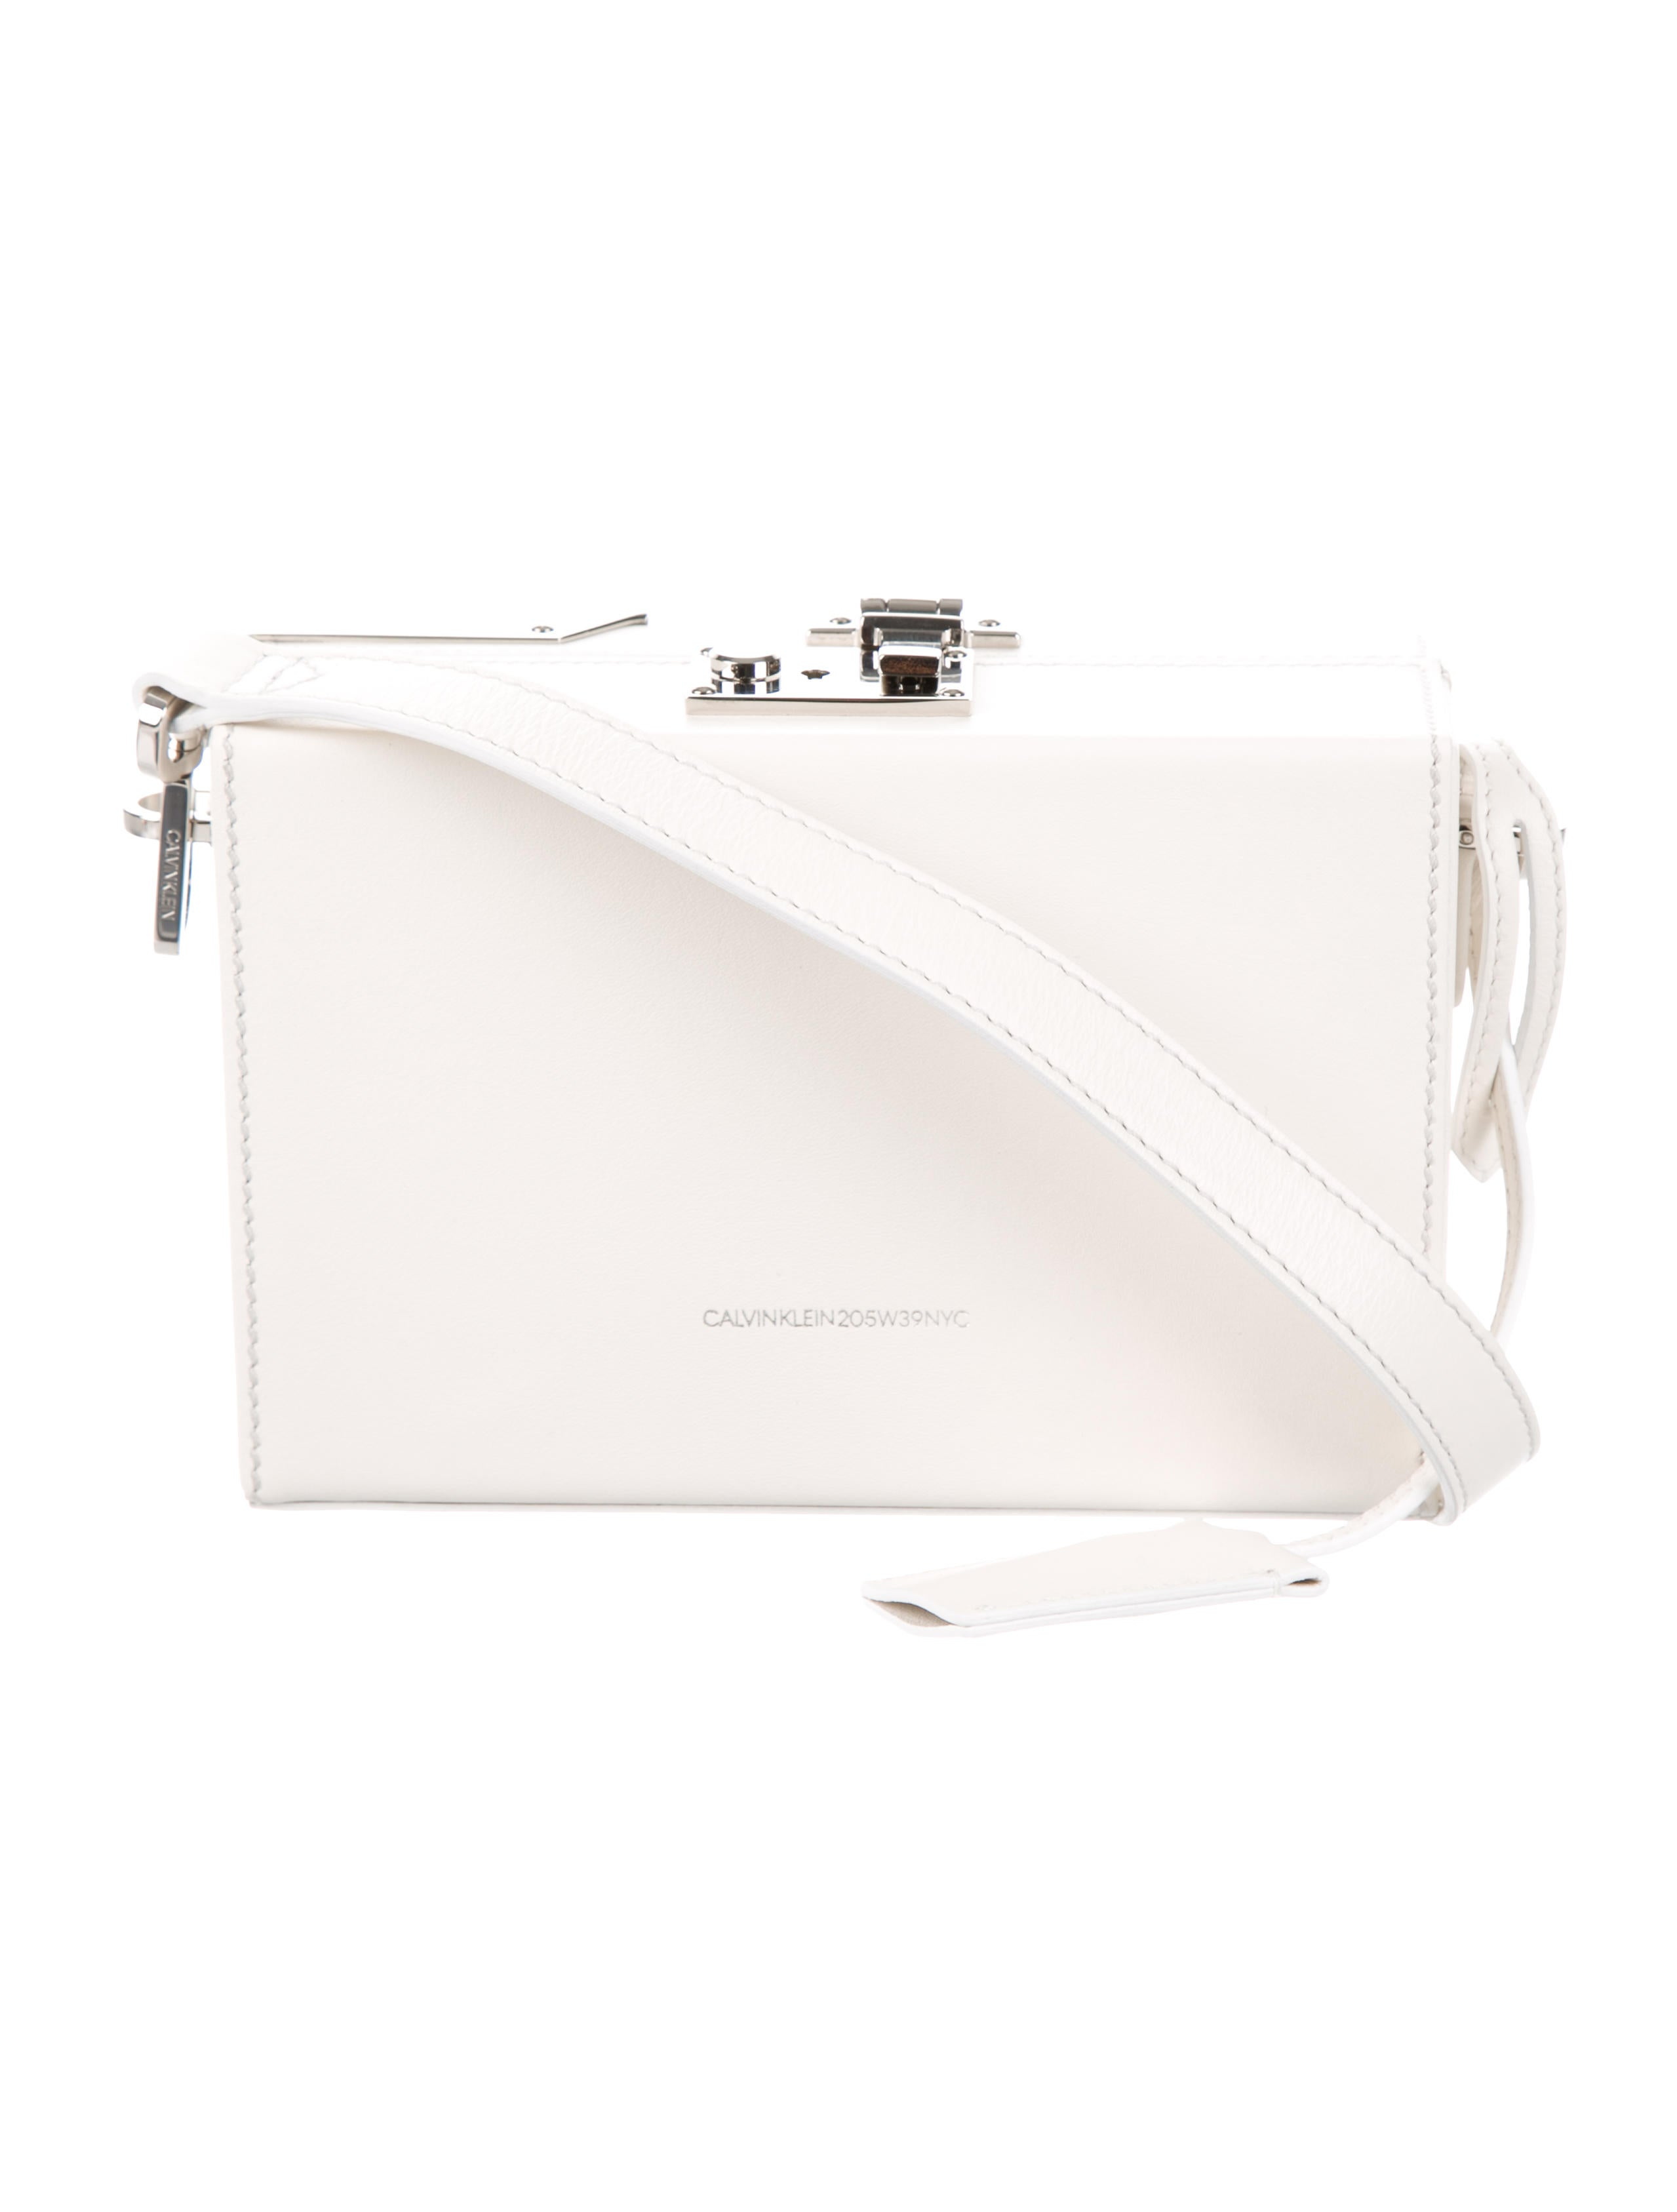 CALVIN KLEIN 205W39NYC Womens Mini-Box Bag HIEpy11fb